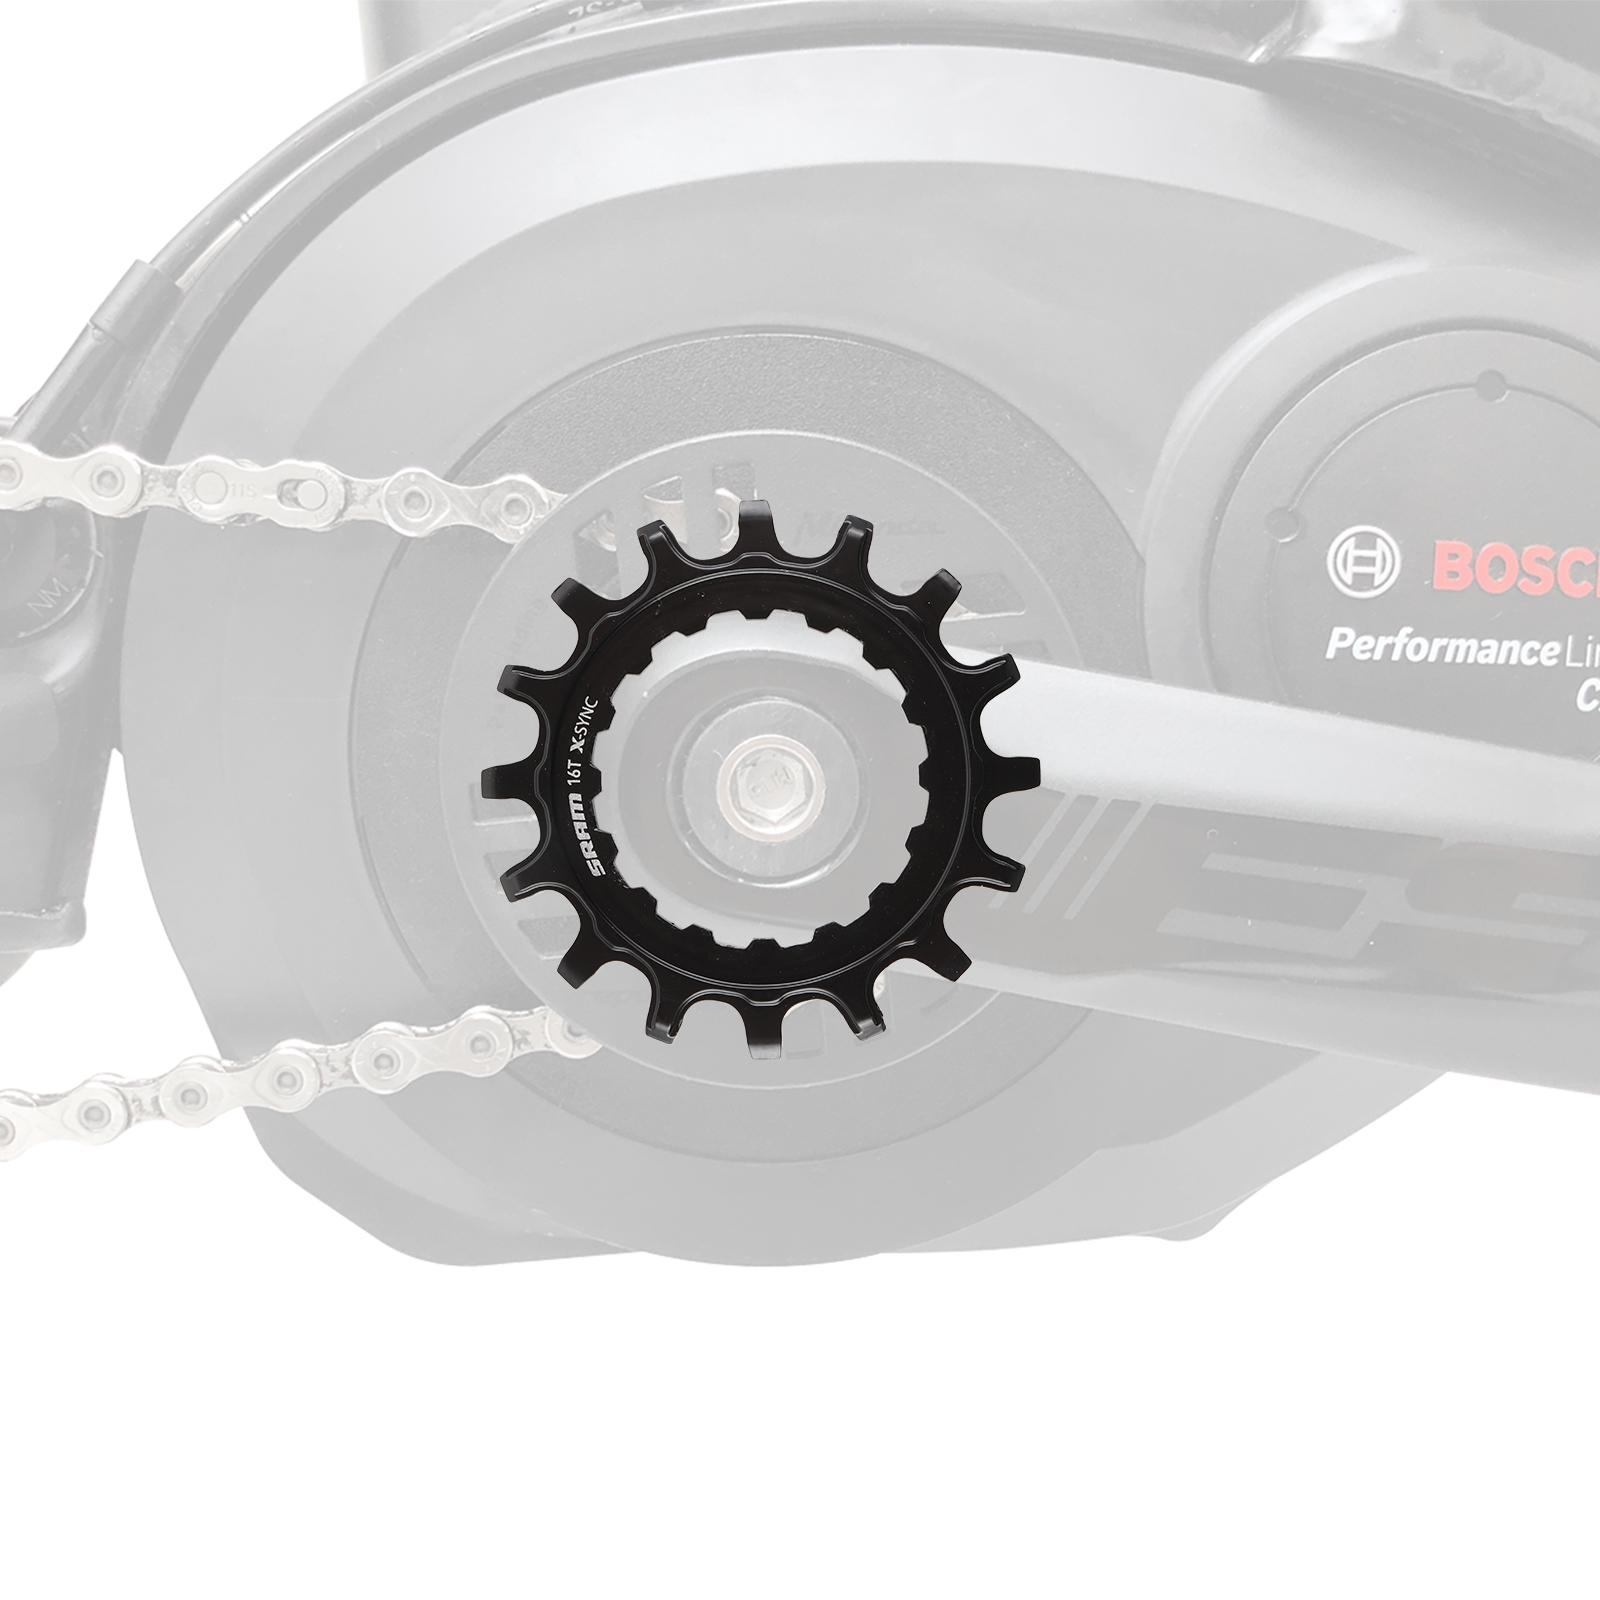 SRAM Kettenblatt 16T EX1 X-Sync™ für Bosch Mittelmotor eBike